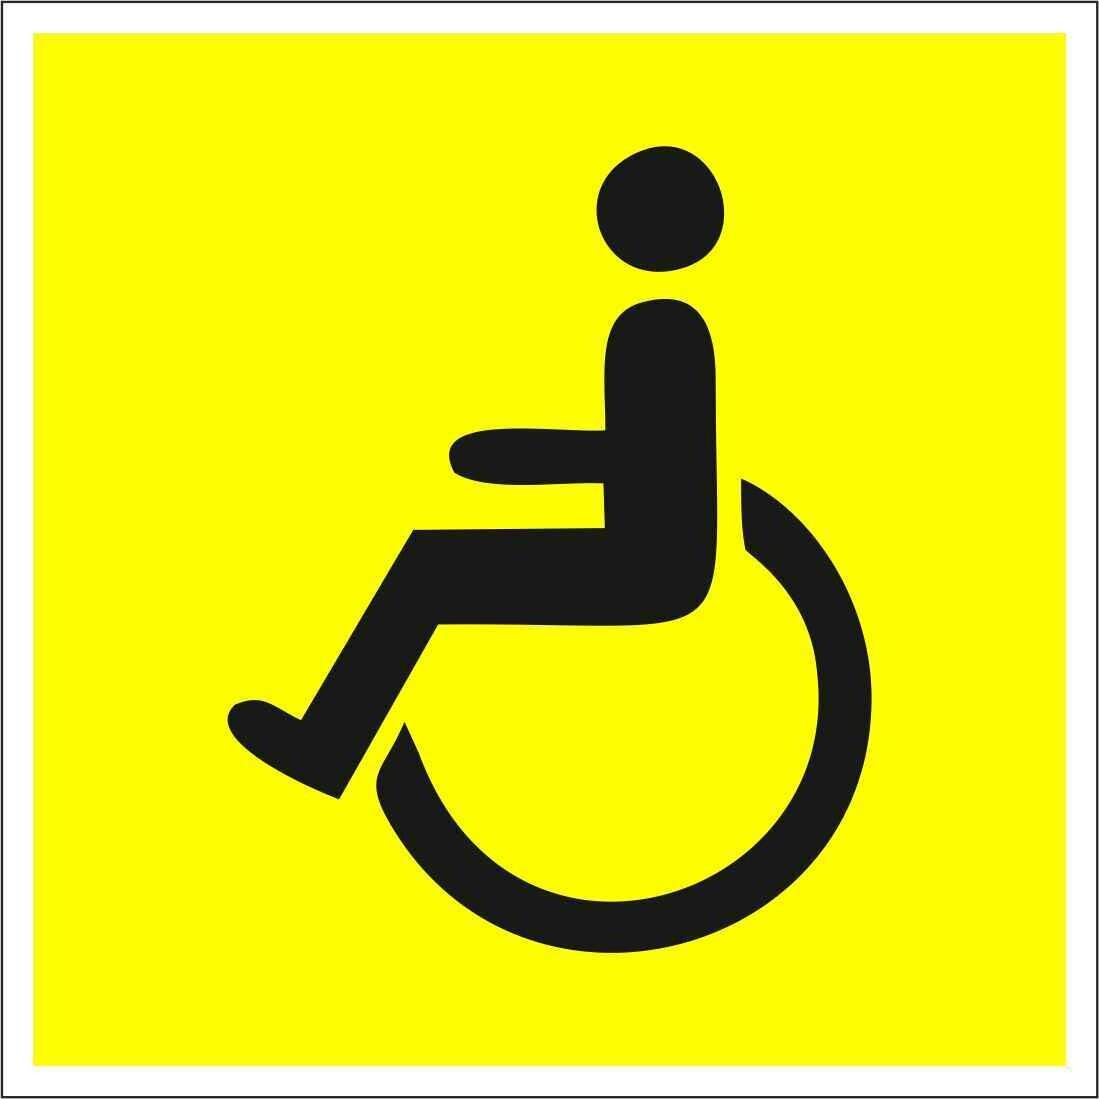 Наклейка За рулем инвалид